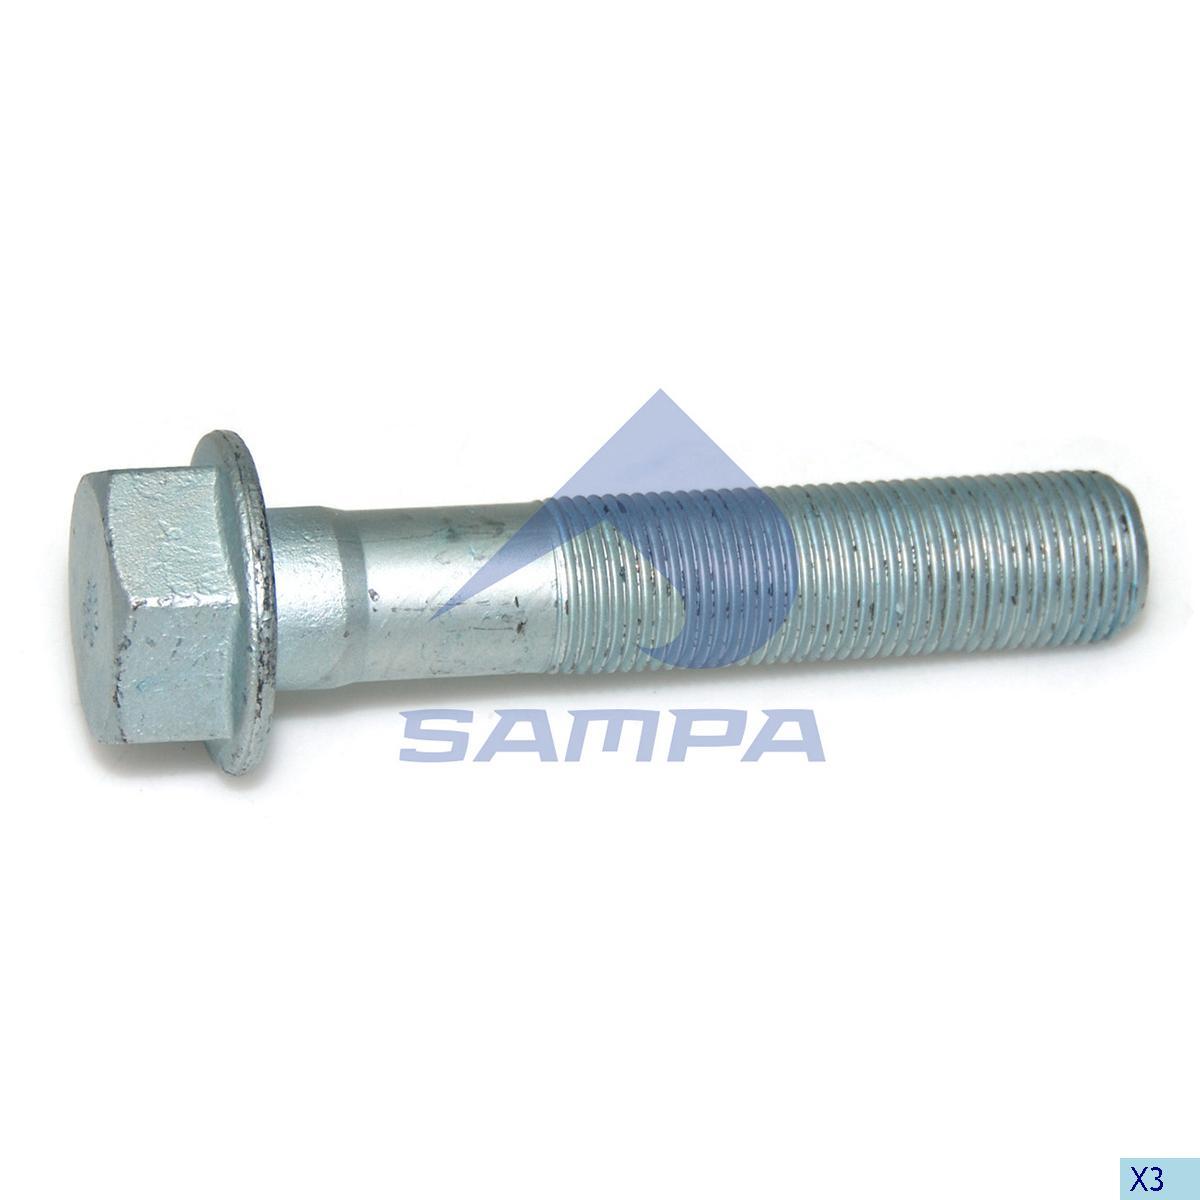 Screw, Axle Rod, Mercedes, Suspension